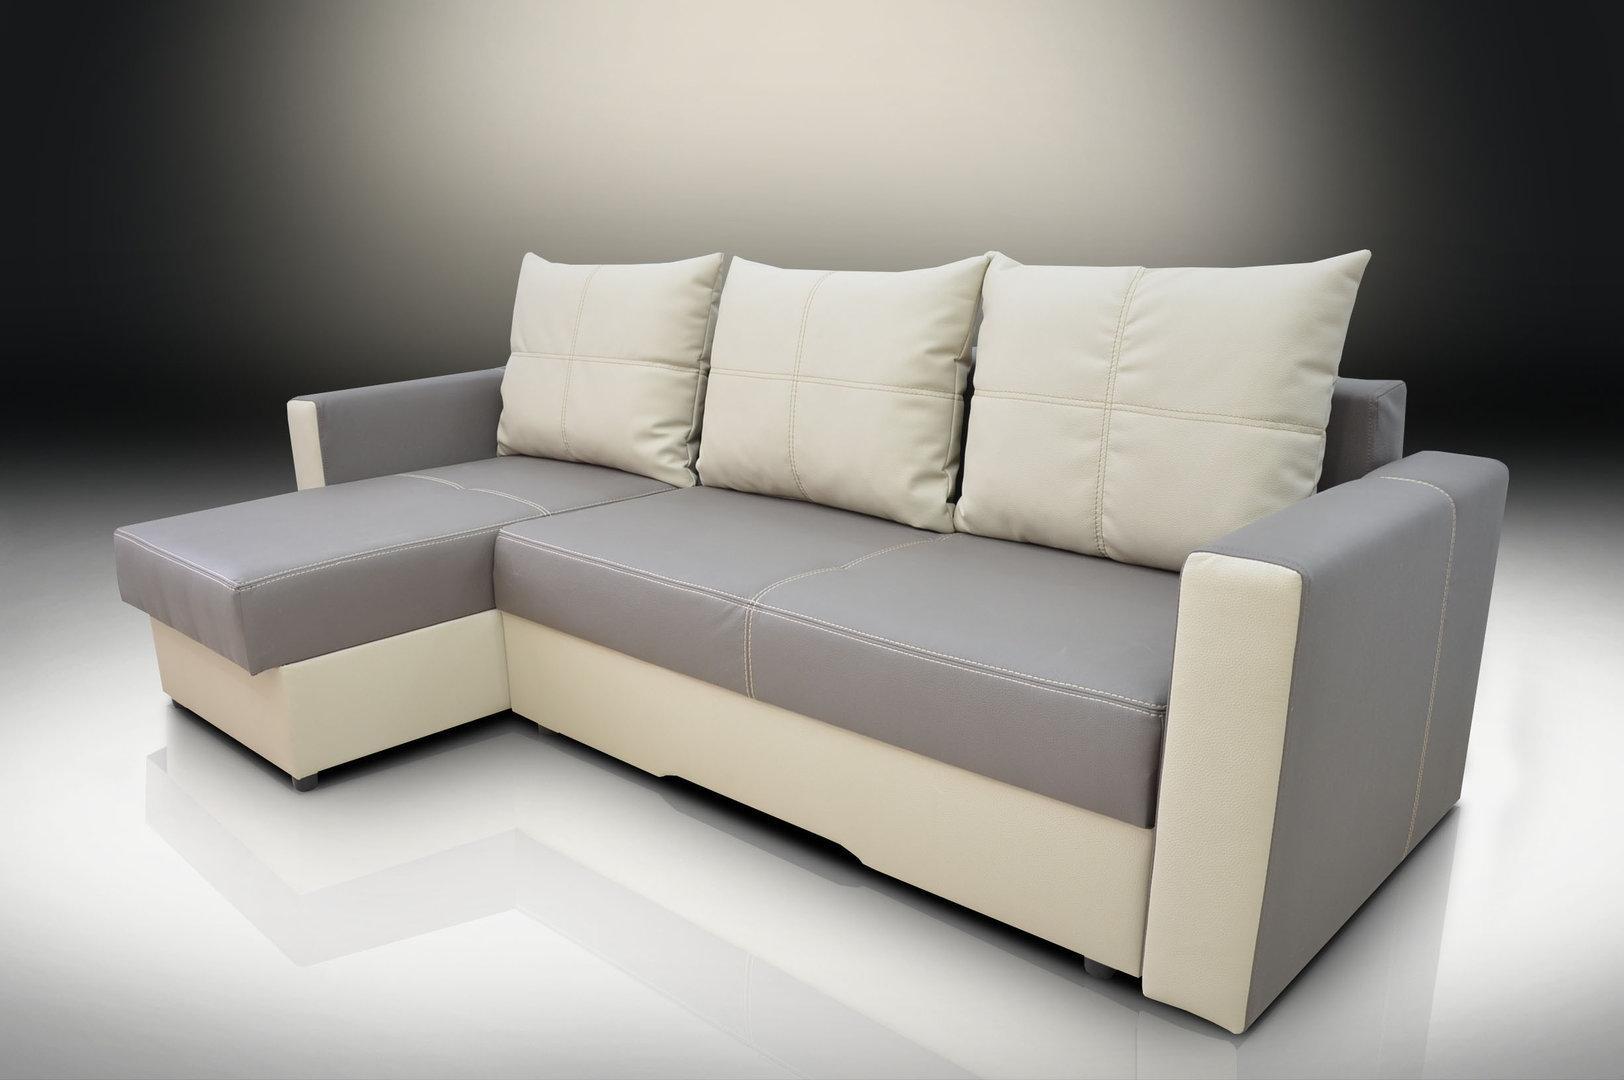 Bonded Leather Corner Sofa Bed Bristol, Elephant/toffee Inside Corner Sofa Bed Sale (View 11 of 20)